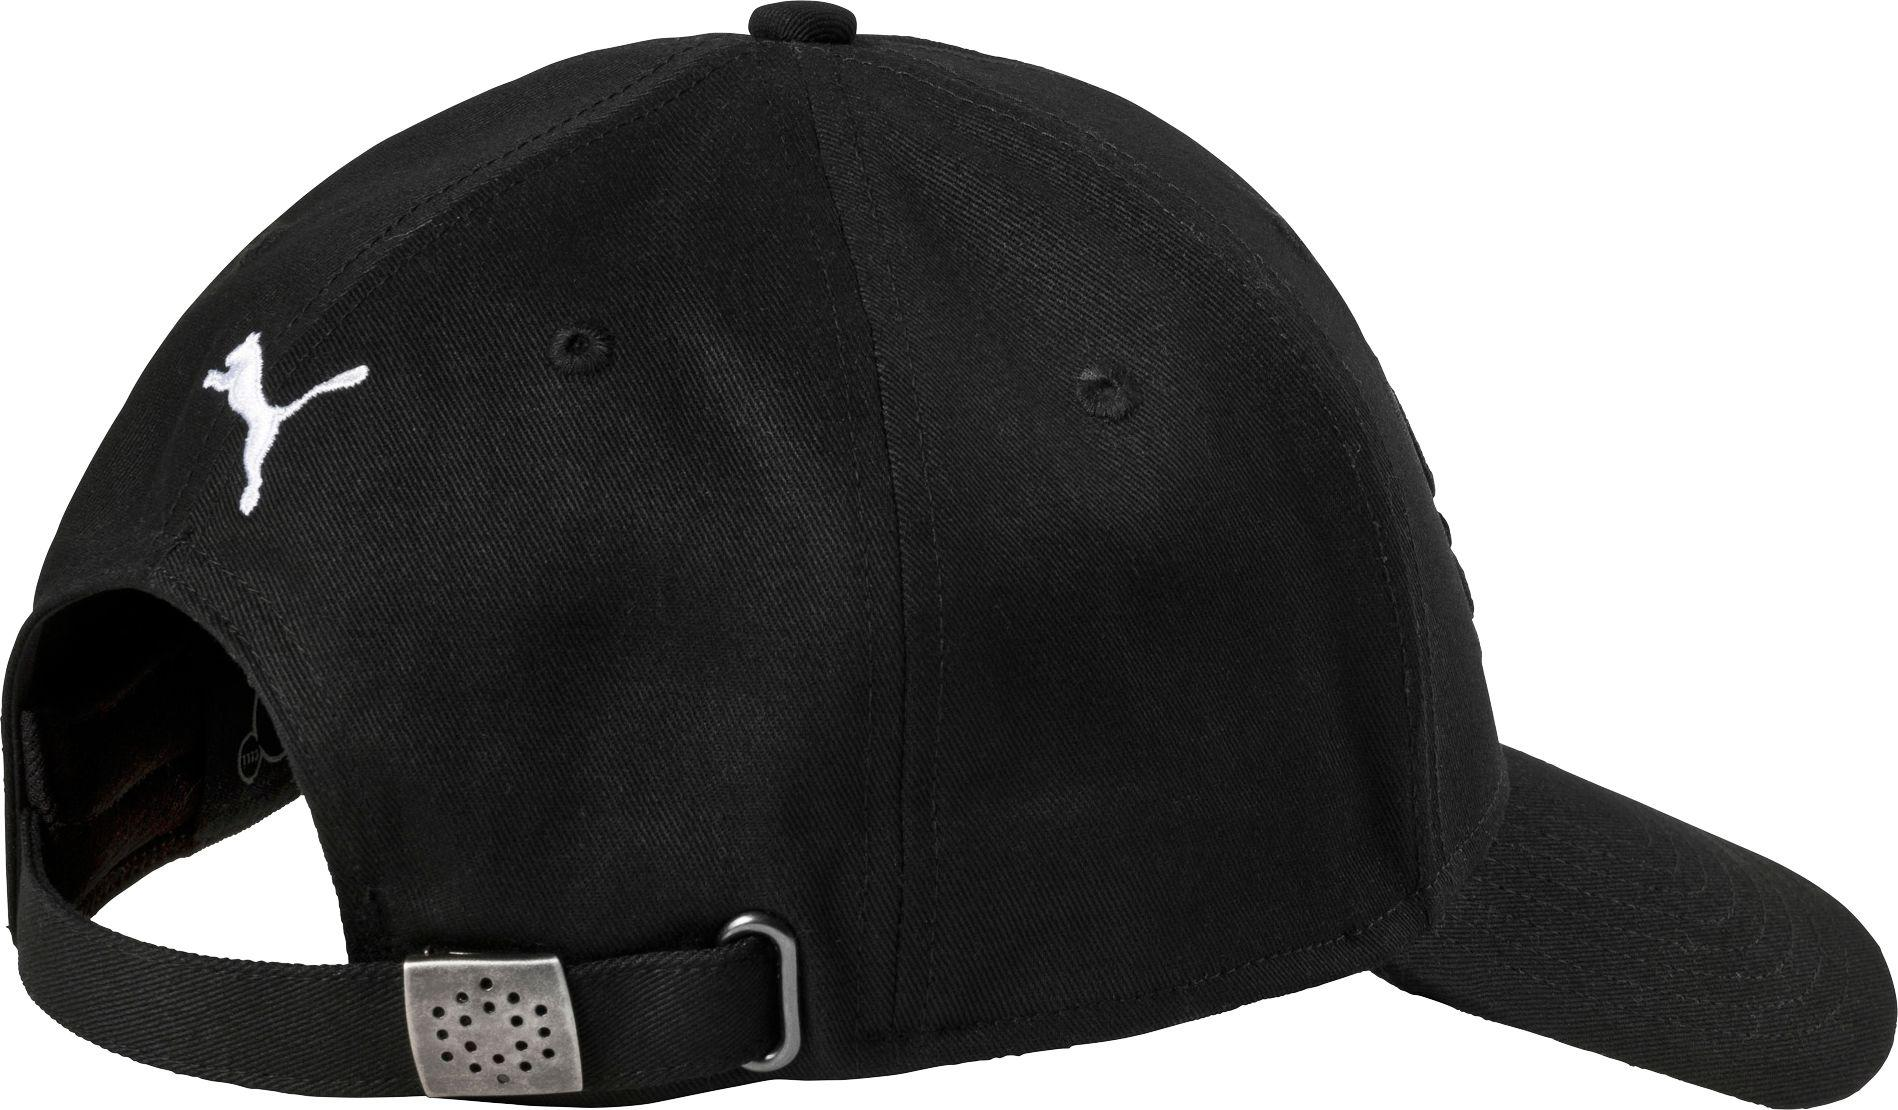 ac2c075df07 Lyst - PUMA Greenskeeper Adjustable Golf Hat in Black for Men